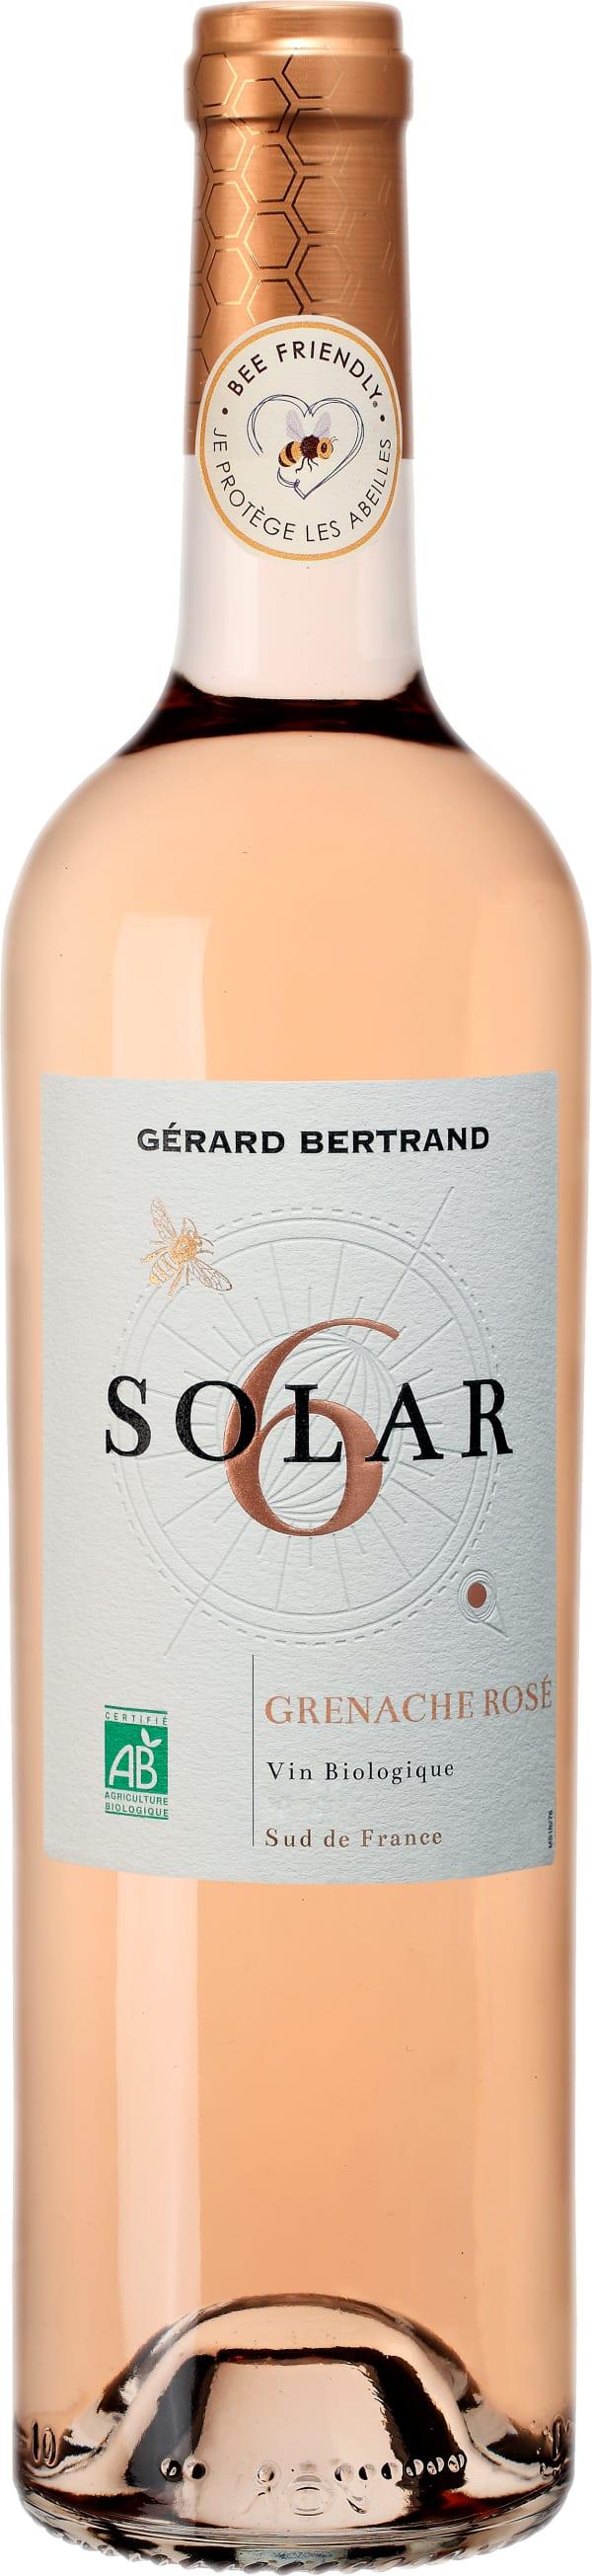 Gérard Bertrand Solar 6 Bee Friendly Rosé Grenache 2018